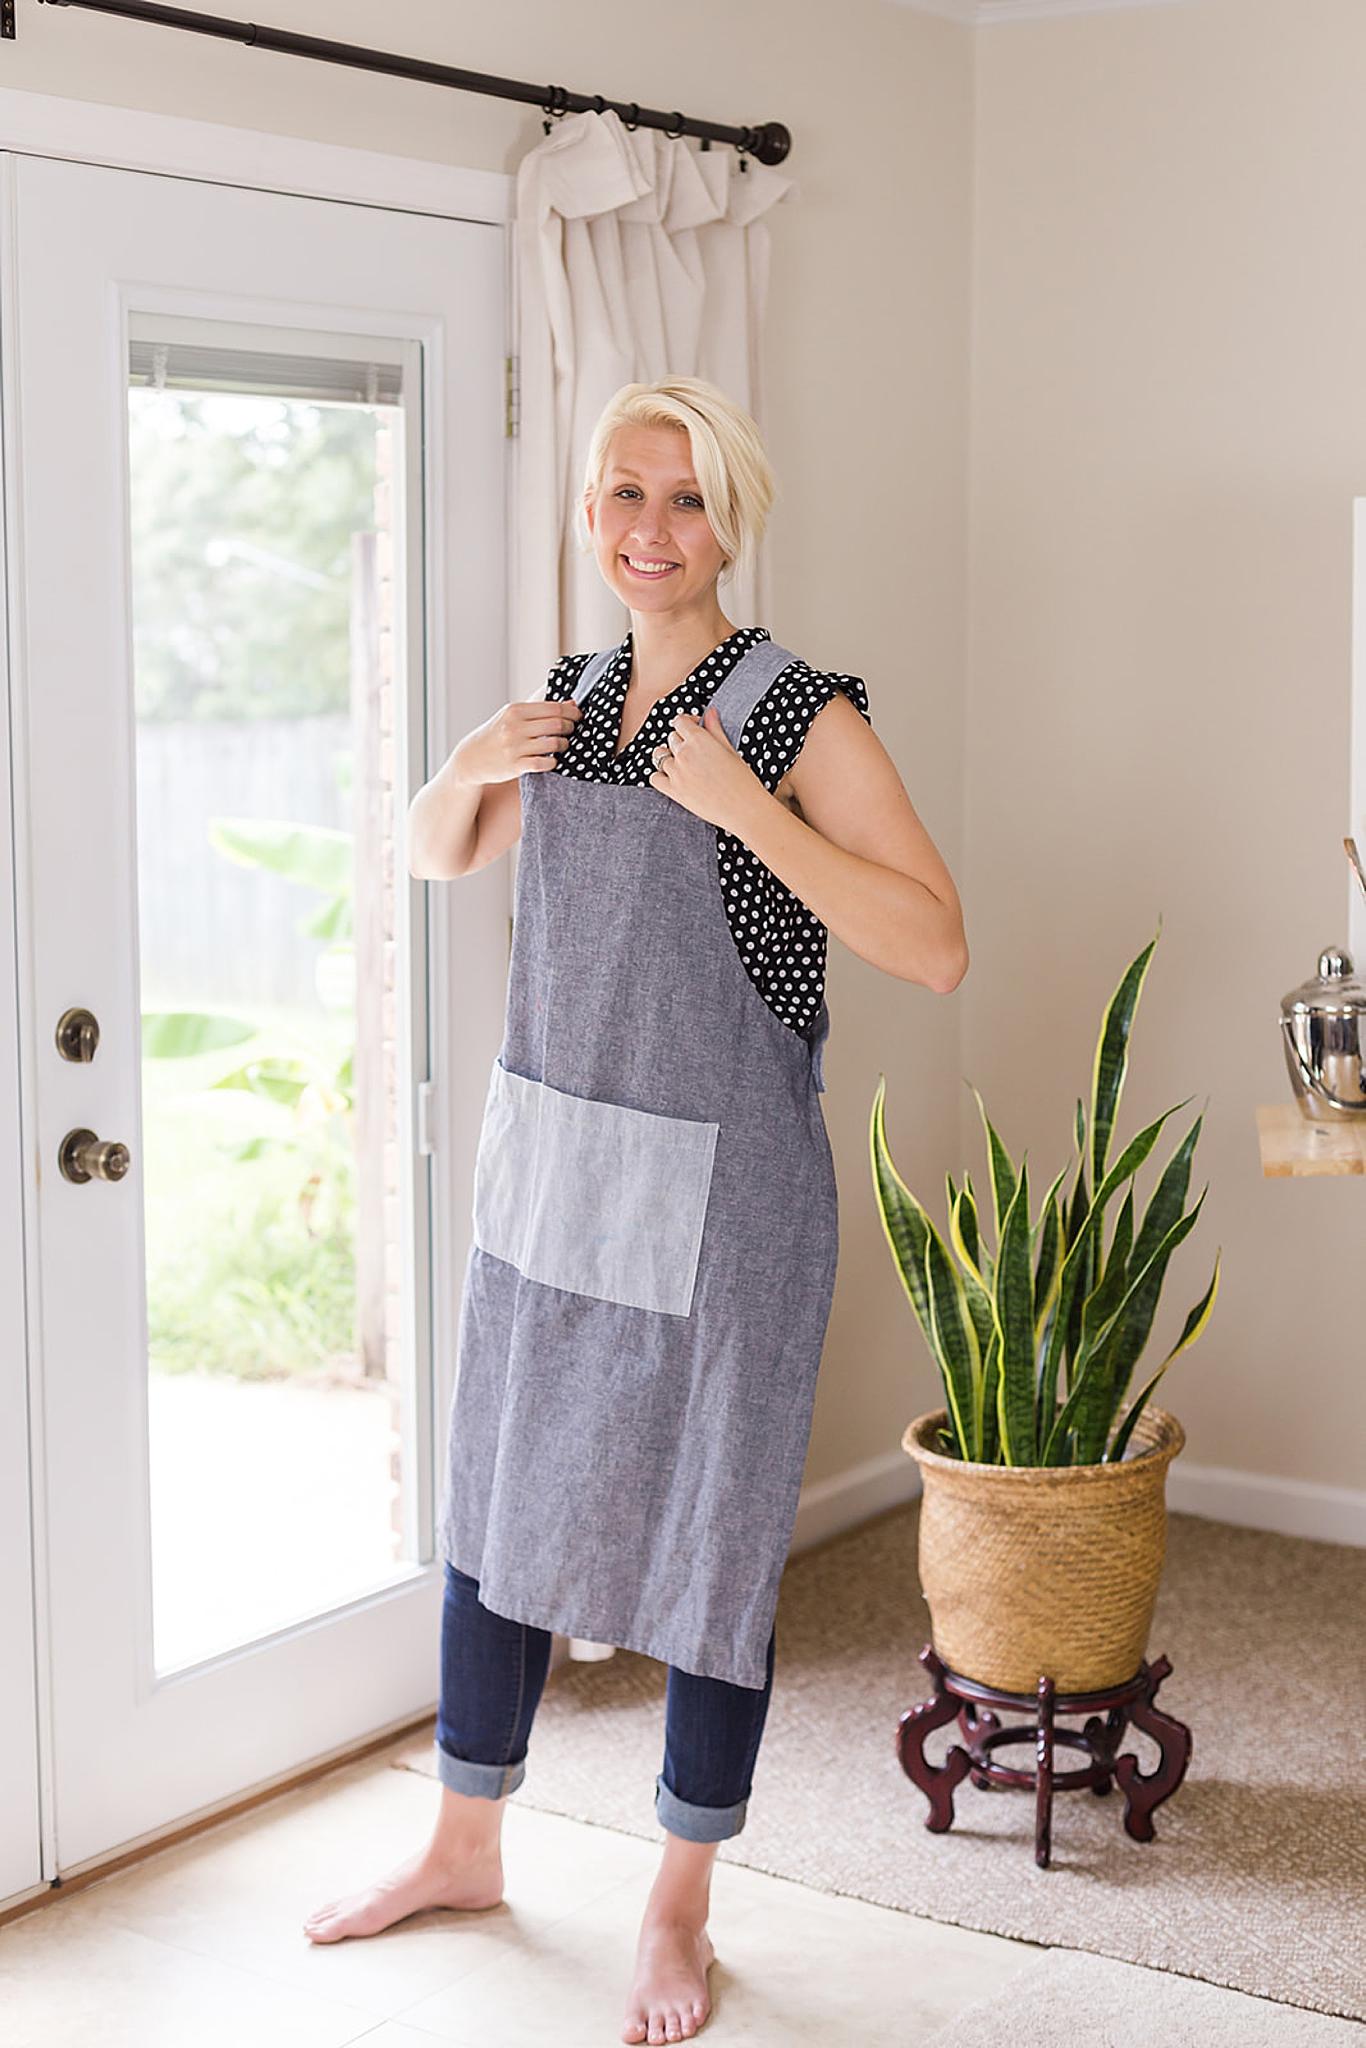 artist puts on apron in home studio